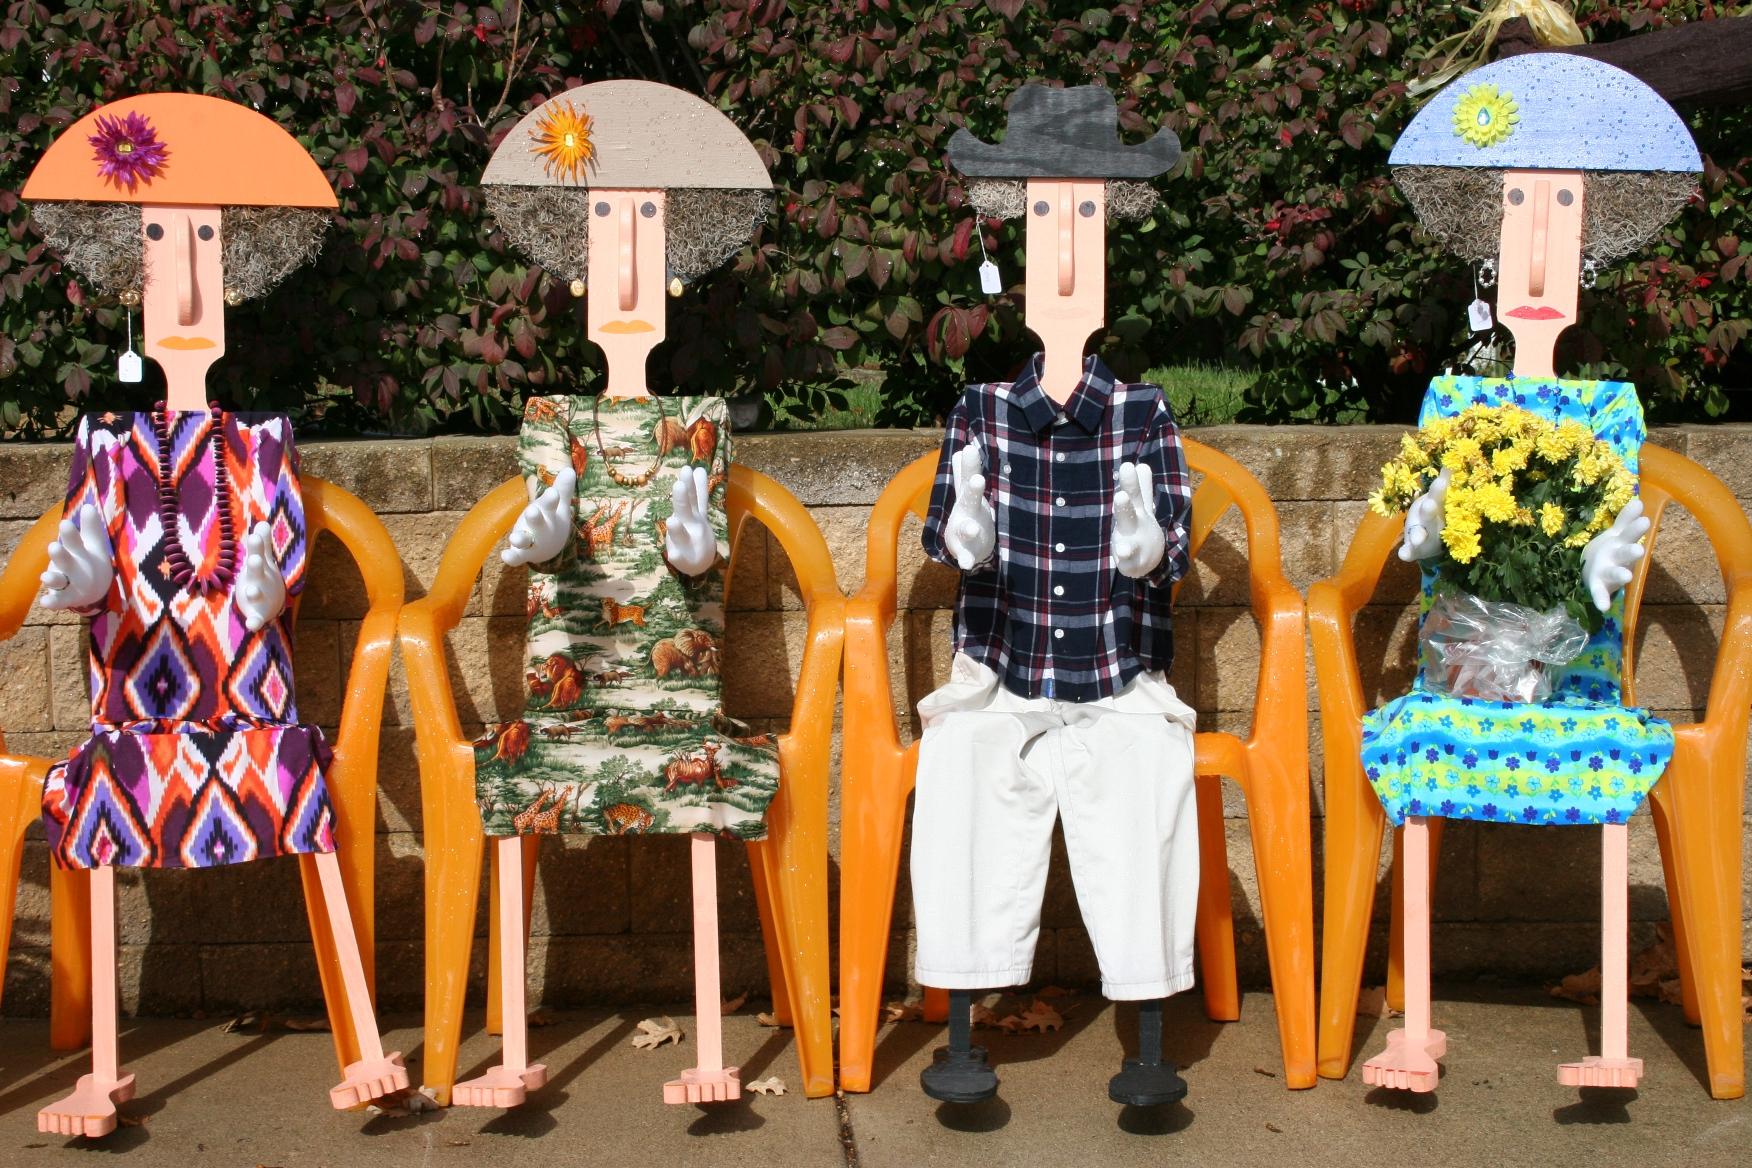 Crafts galore a bonus scarecrow contest minnesota for Crafts to make for sale